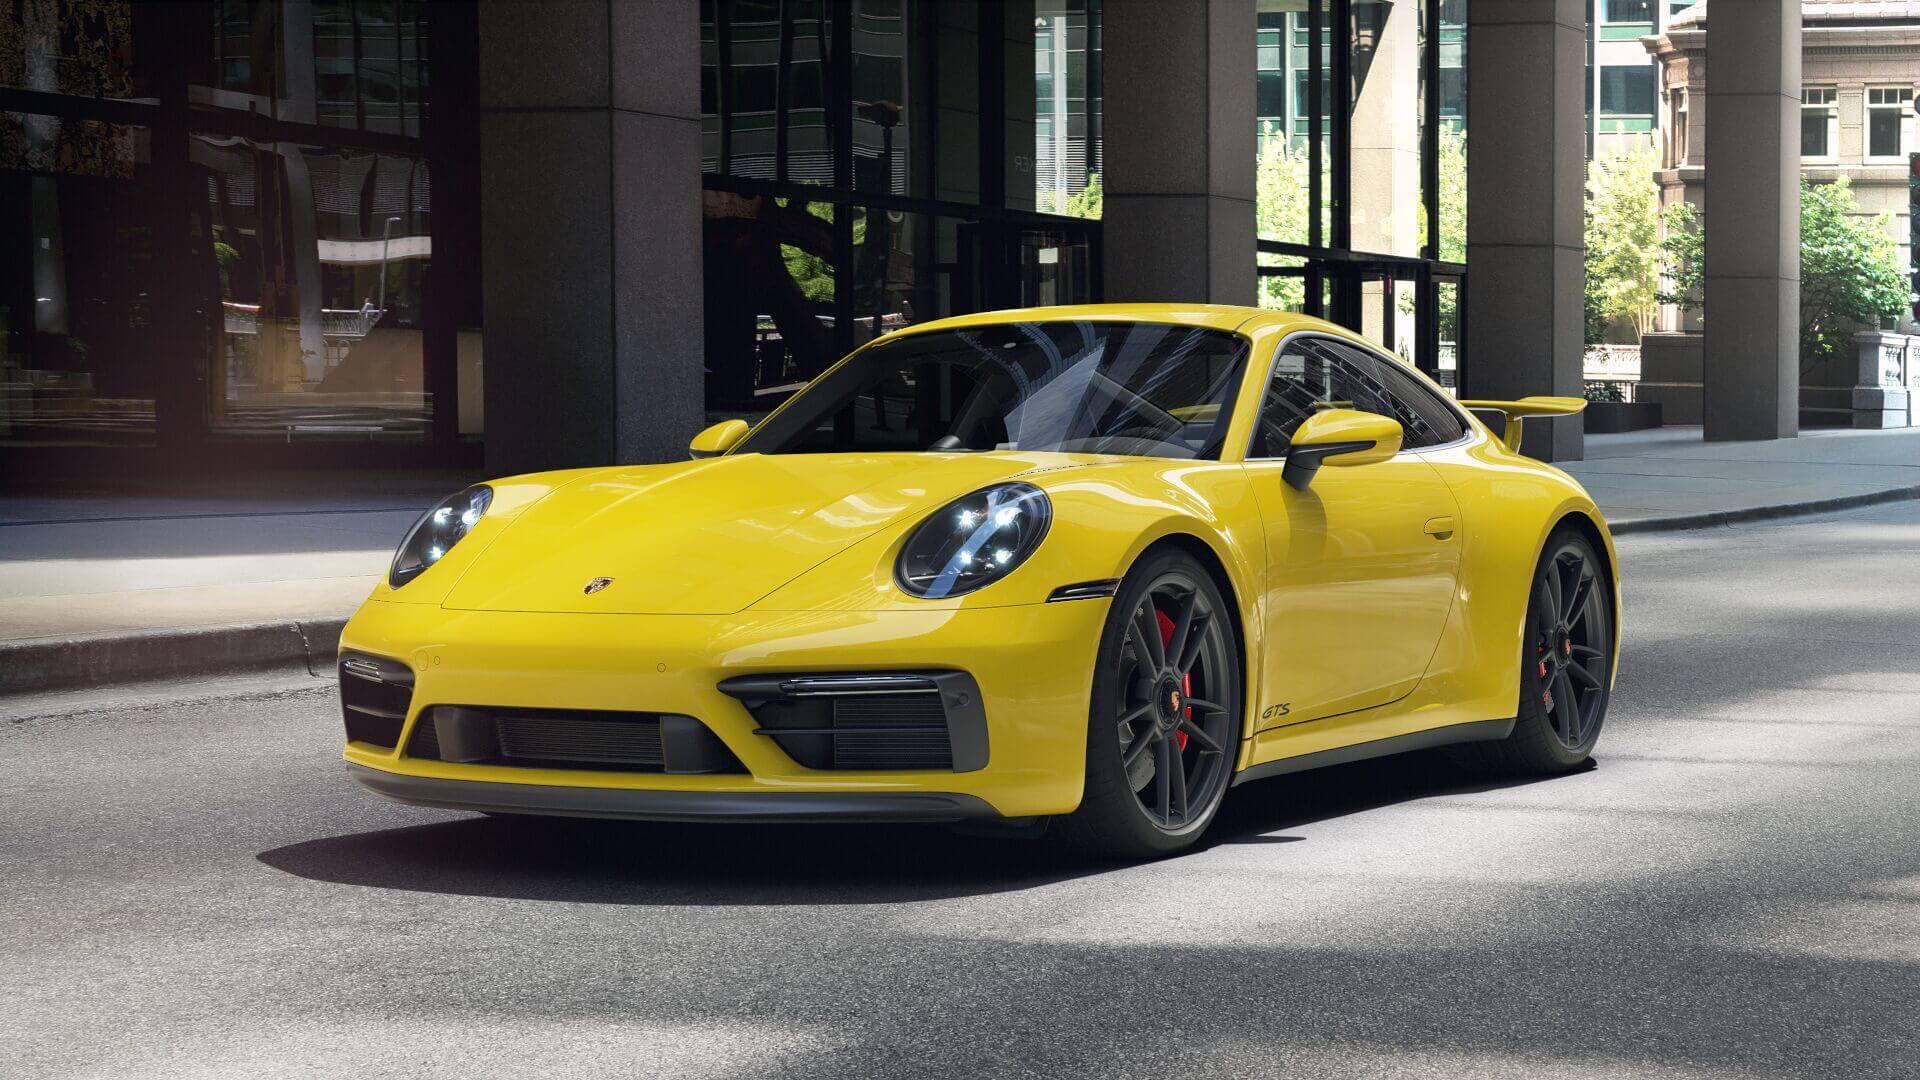 2021 Porsche 911 Carrera GTS